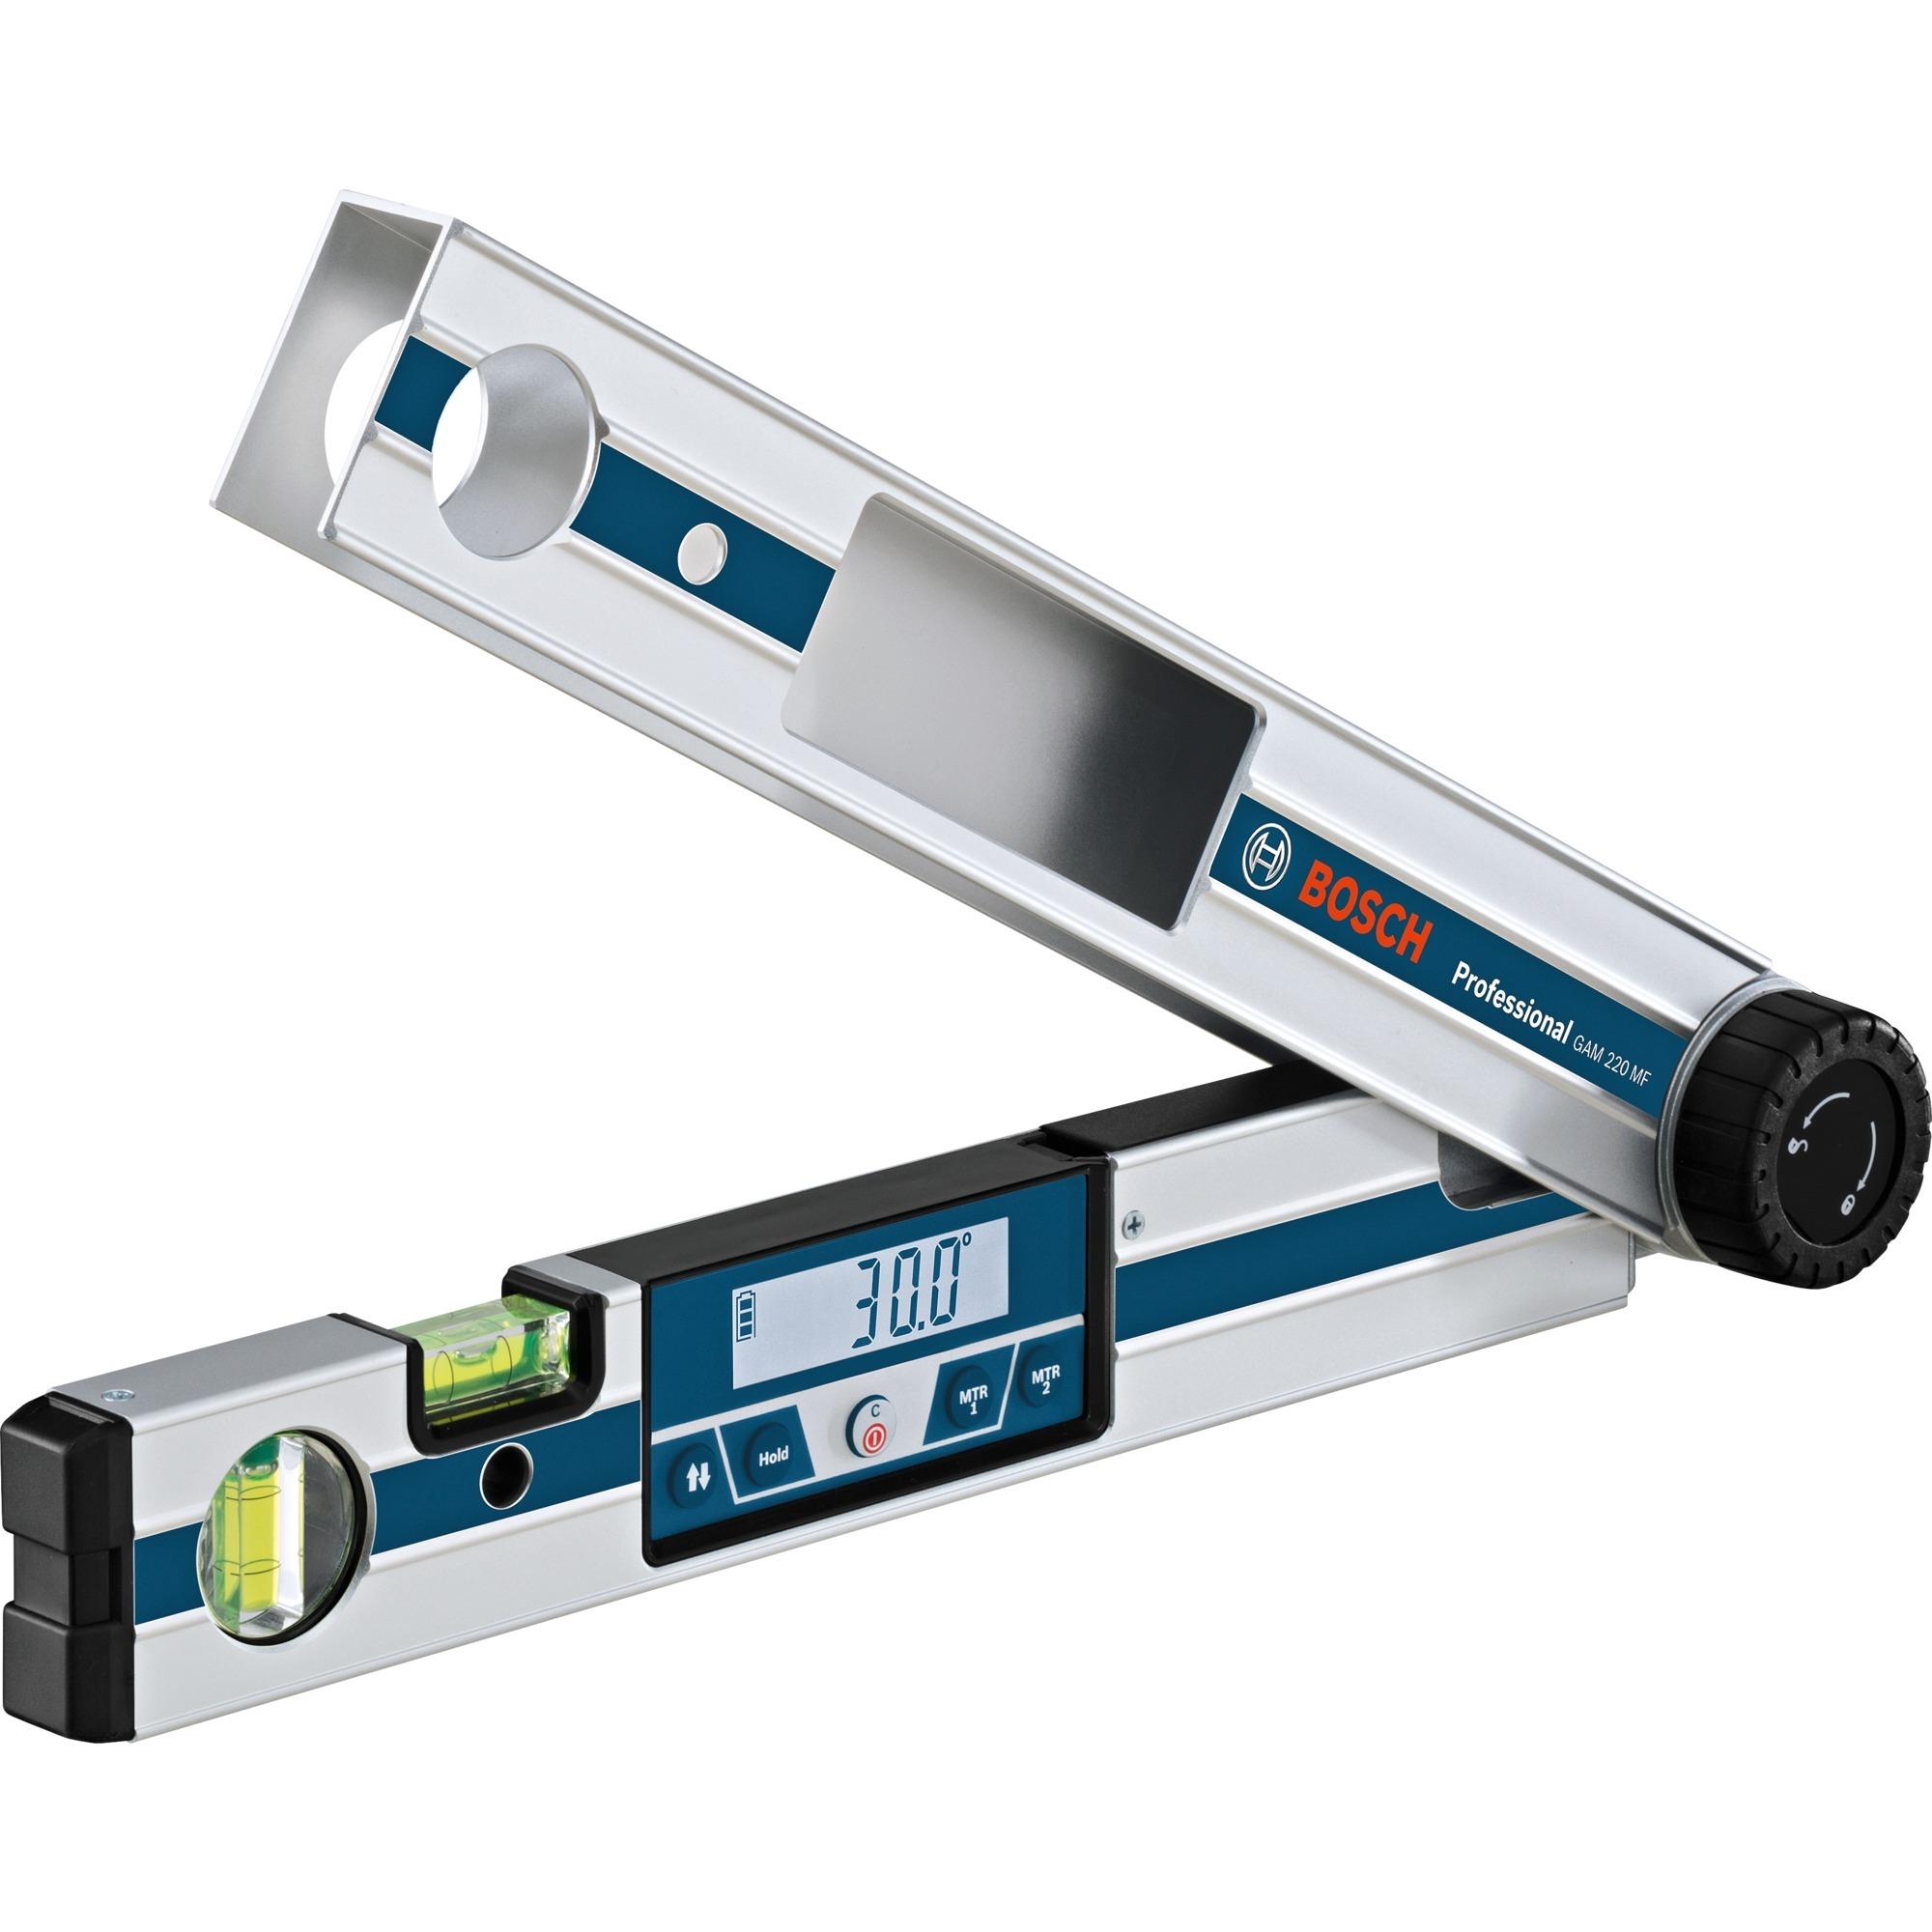 GAM 220 MF Professional medidor de ángulos digital 0 - 220°, Transportador